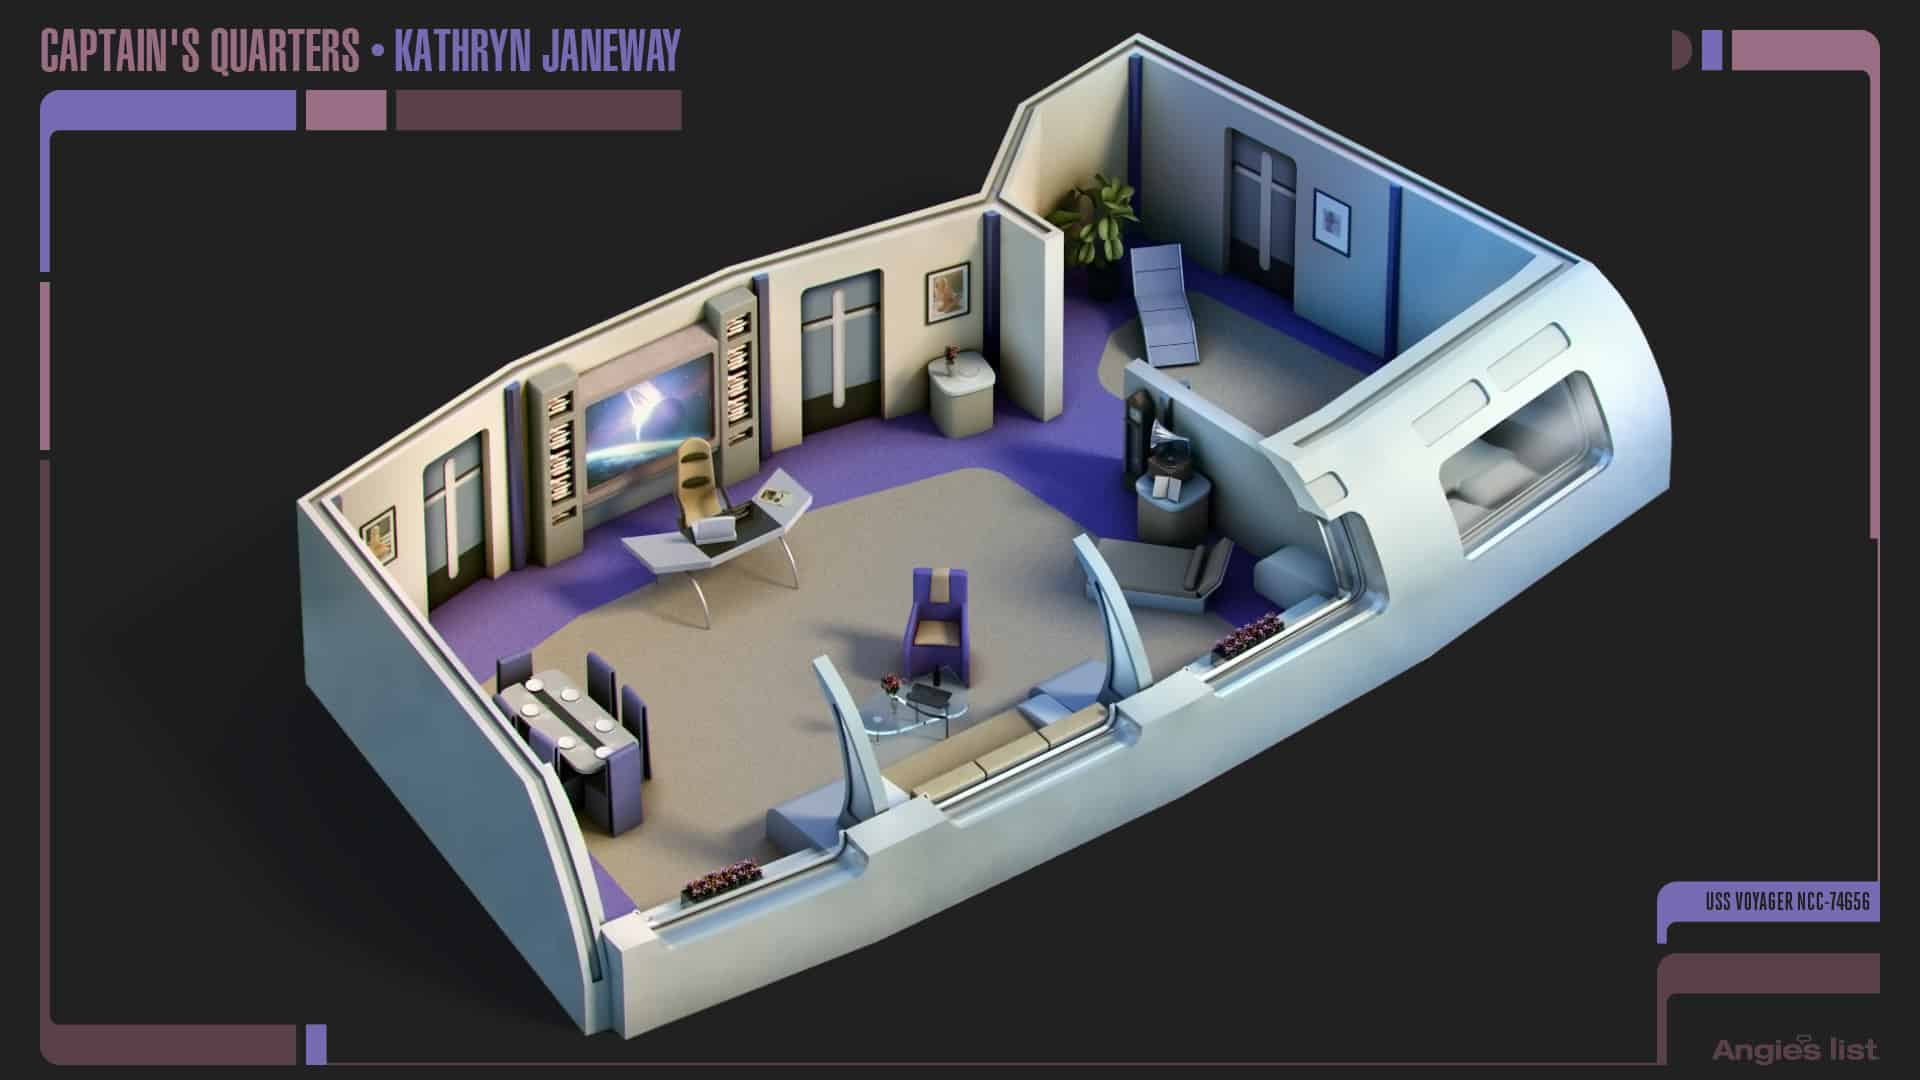 4 Kathryn Janeway quarters